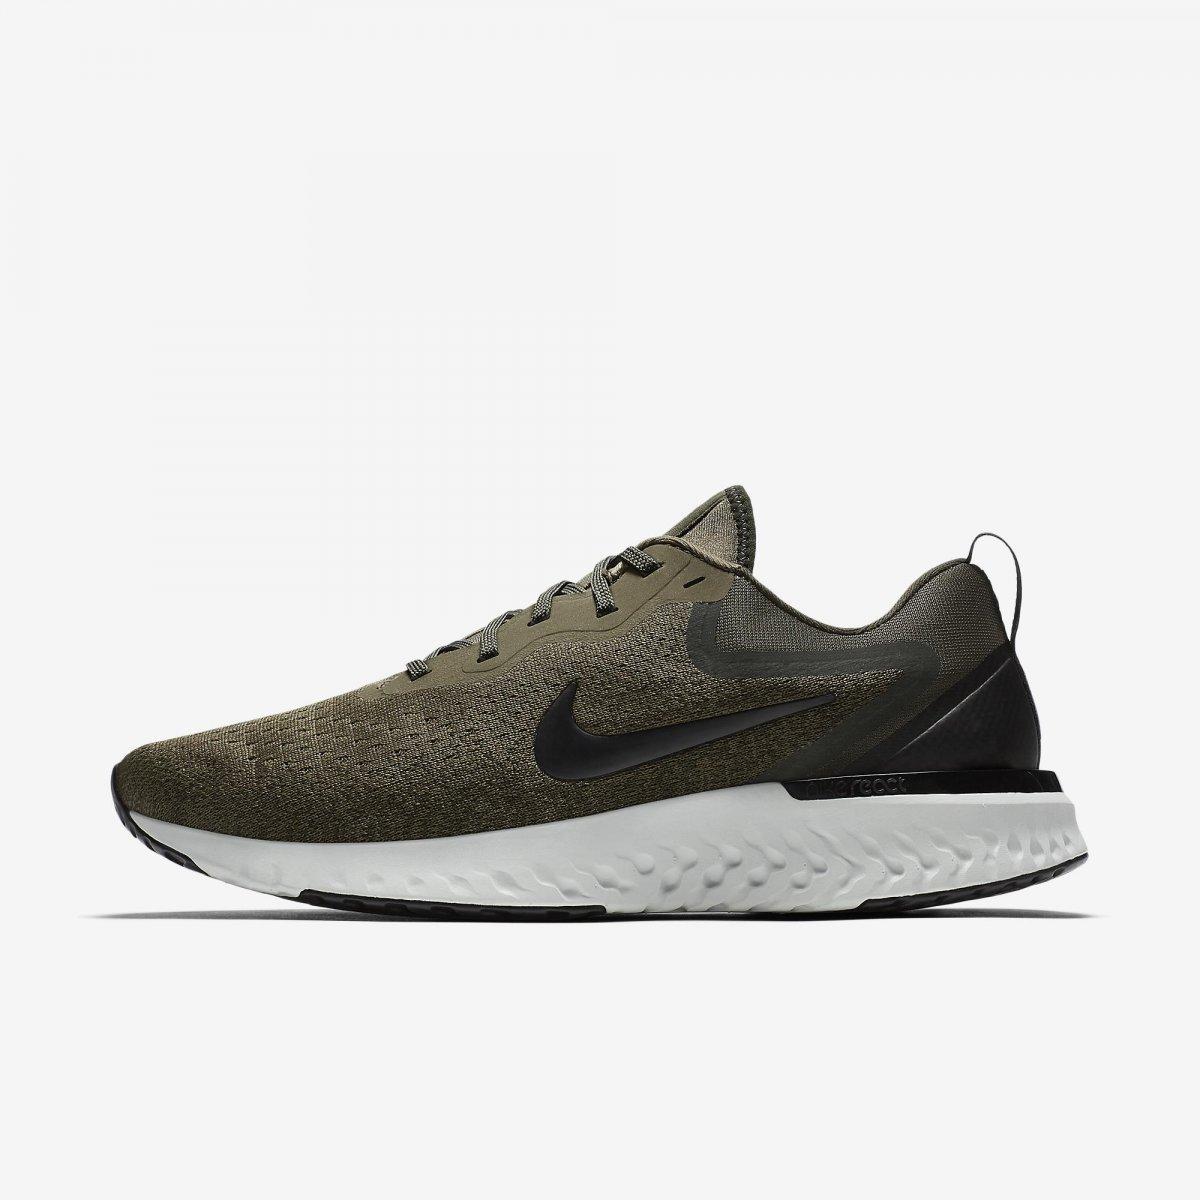 25504b77fc Tênis Nike Odyssey React Masculino 0887231043REACT Nike - VERDE ...